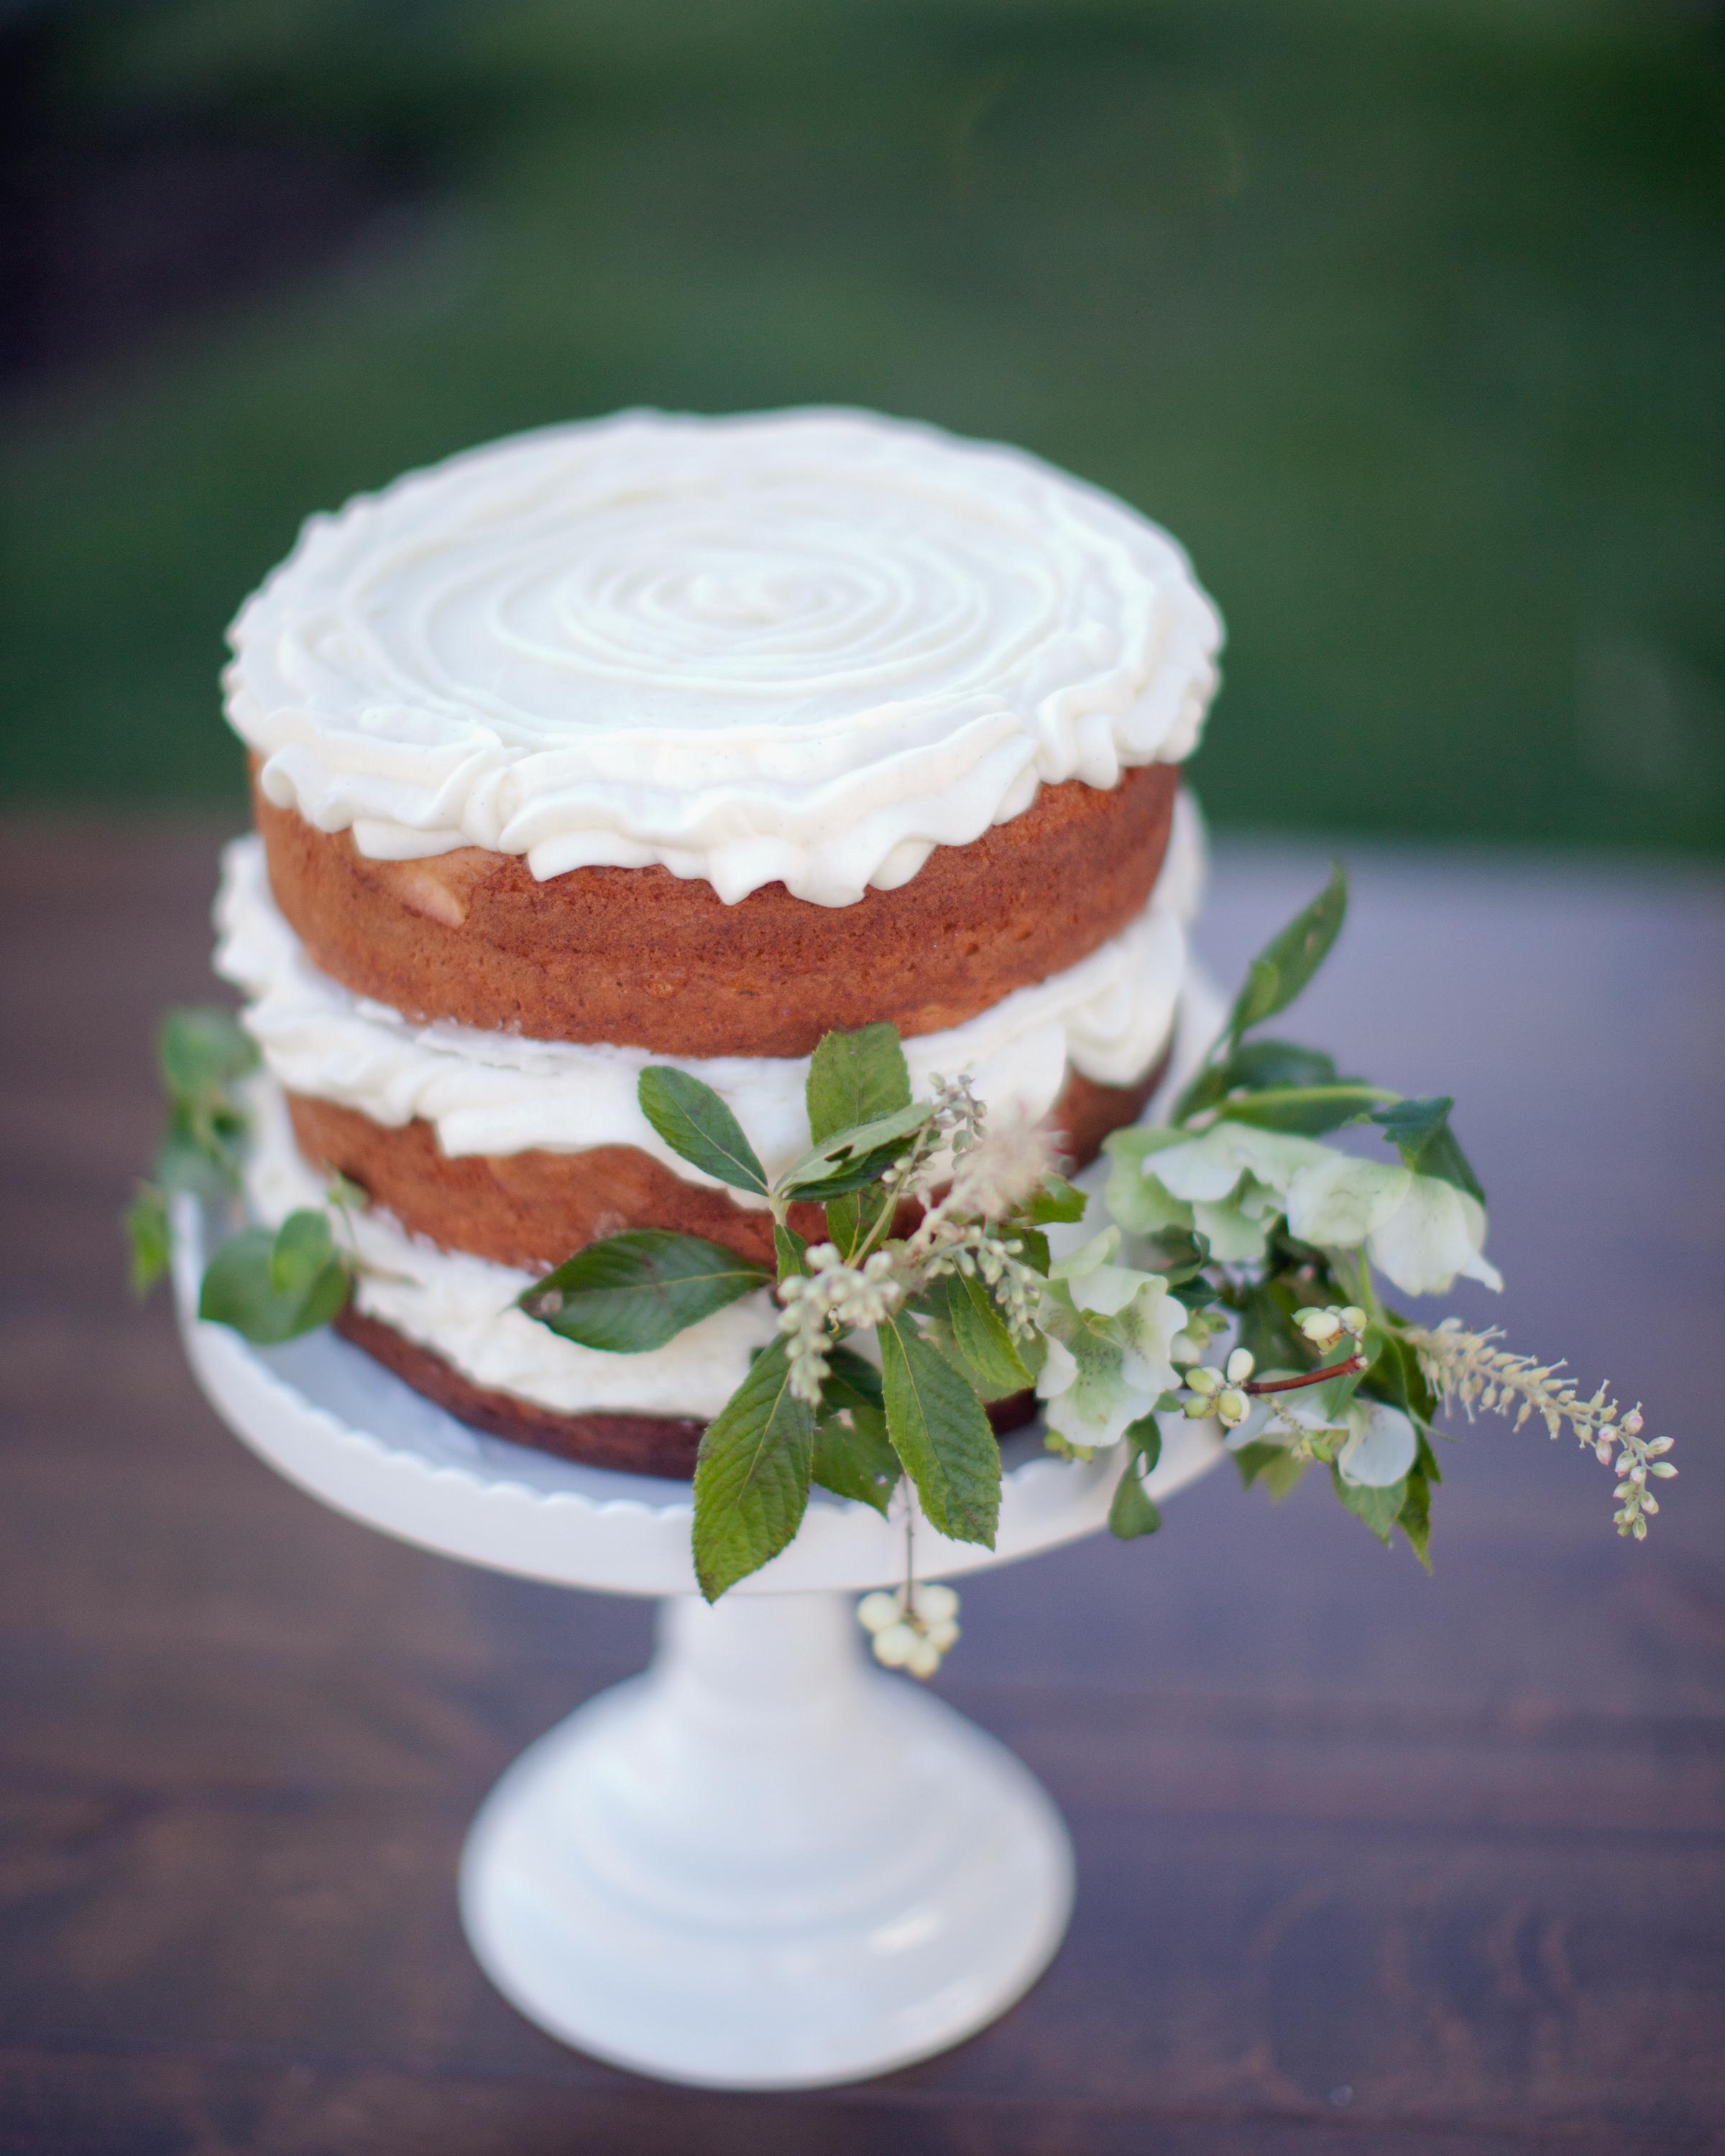 lizzy-pat-wedding-cake-171-s111777-0115.jpg